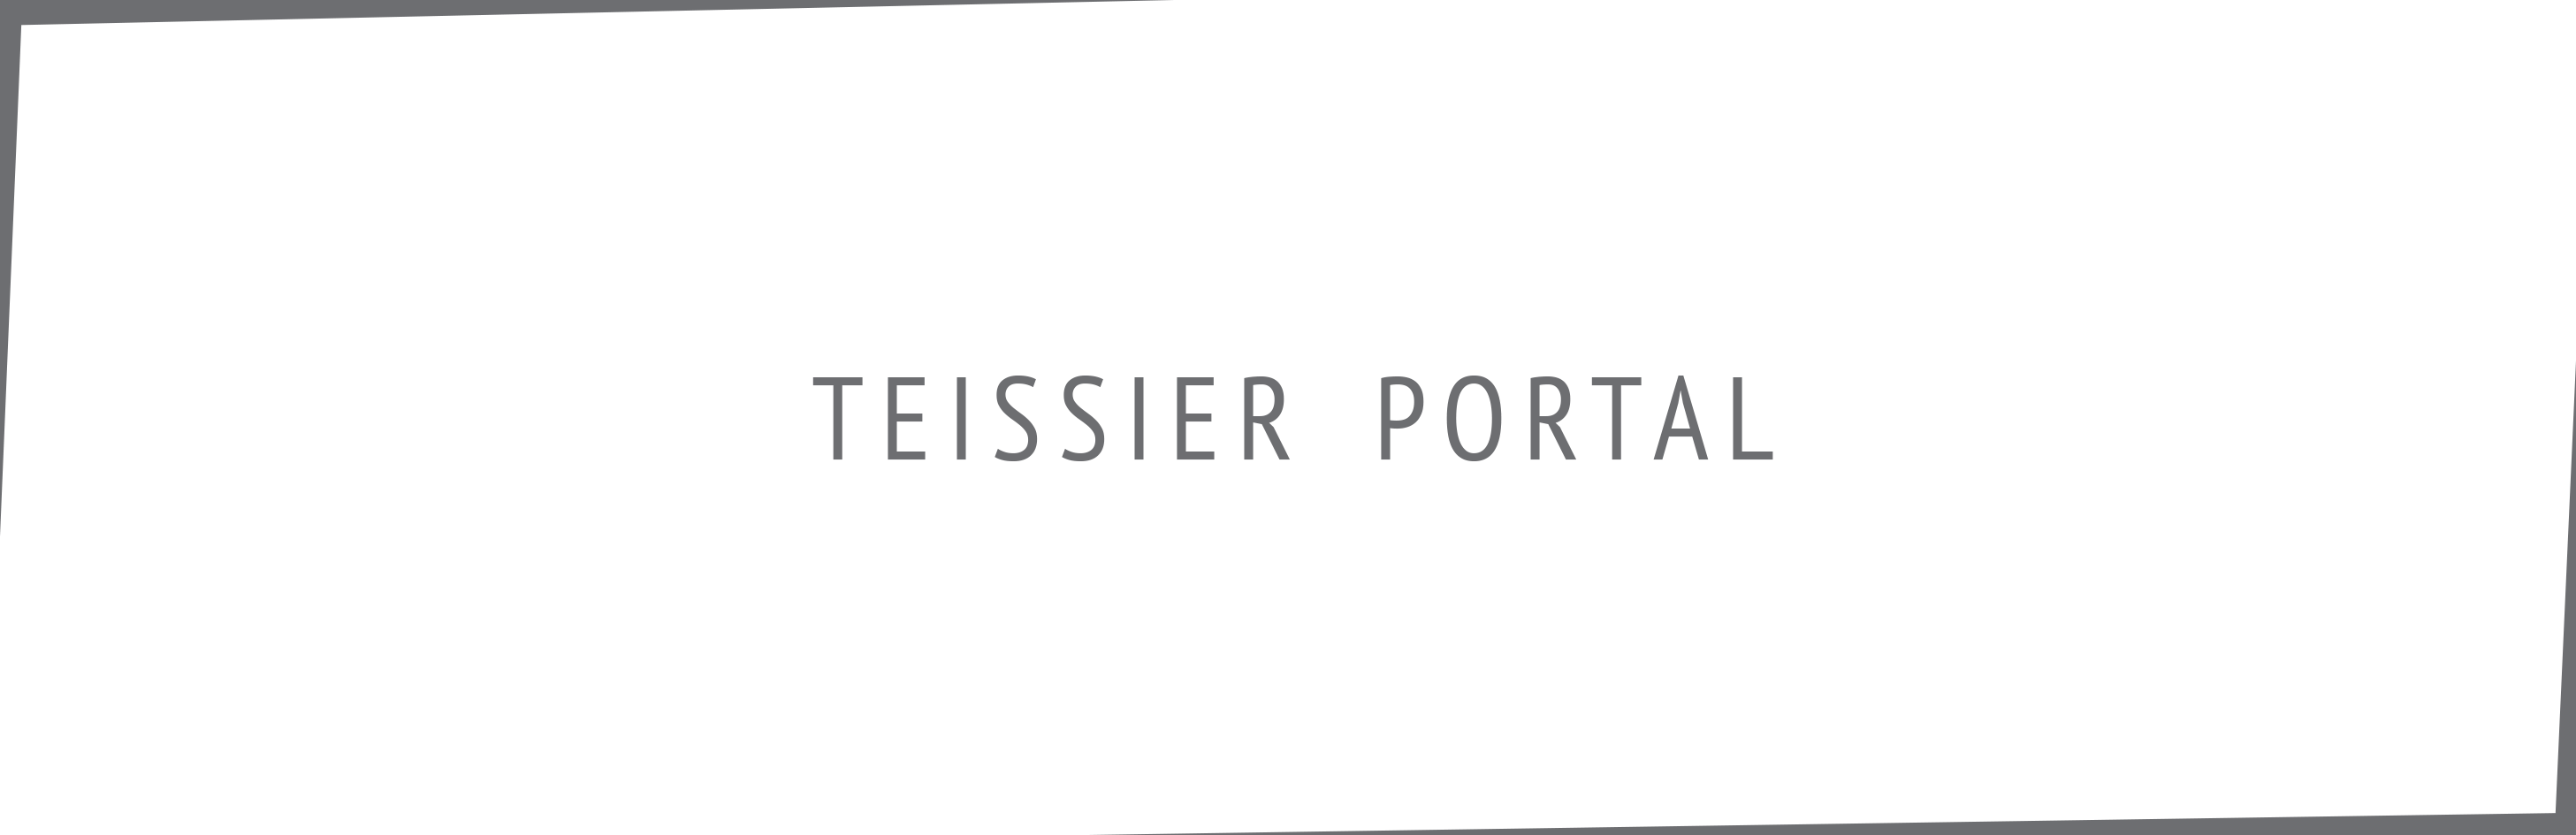 CLIQ agences-Teissier Portal Pano